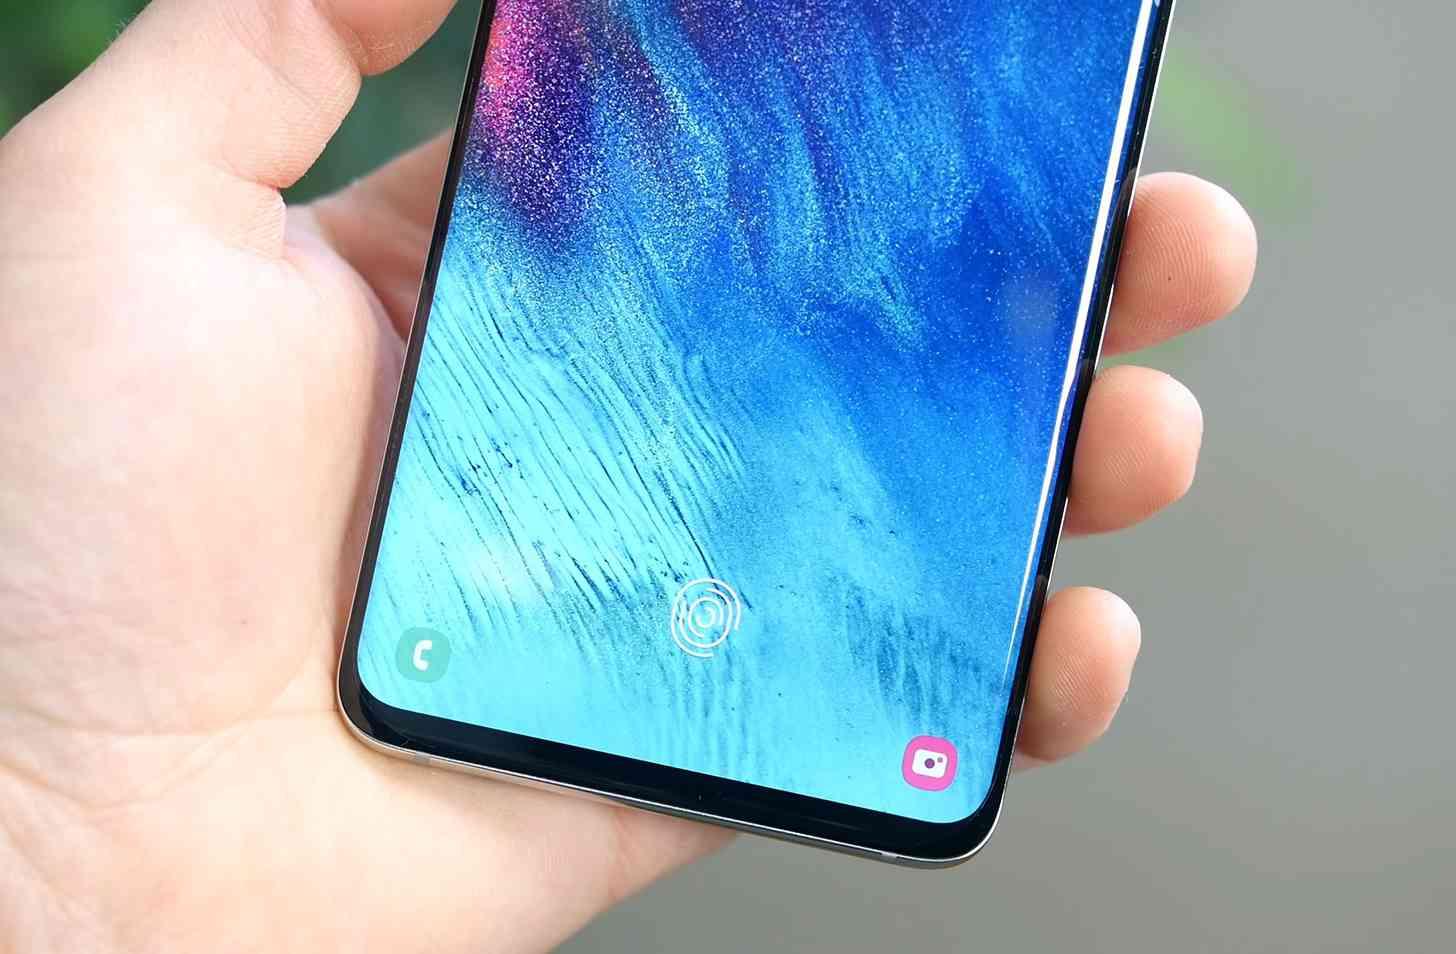 Samsung Galaxy S10 in-display fingerprint sensor